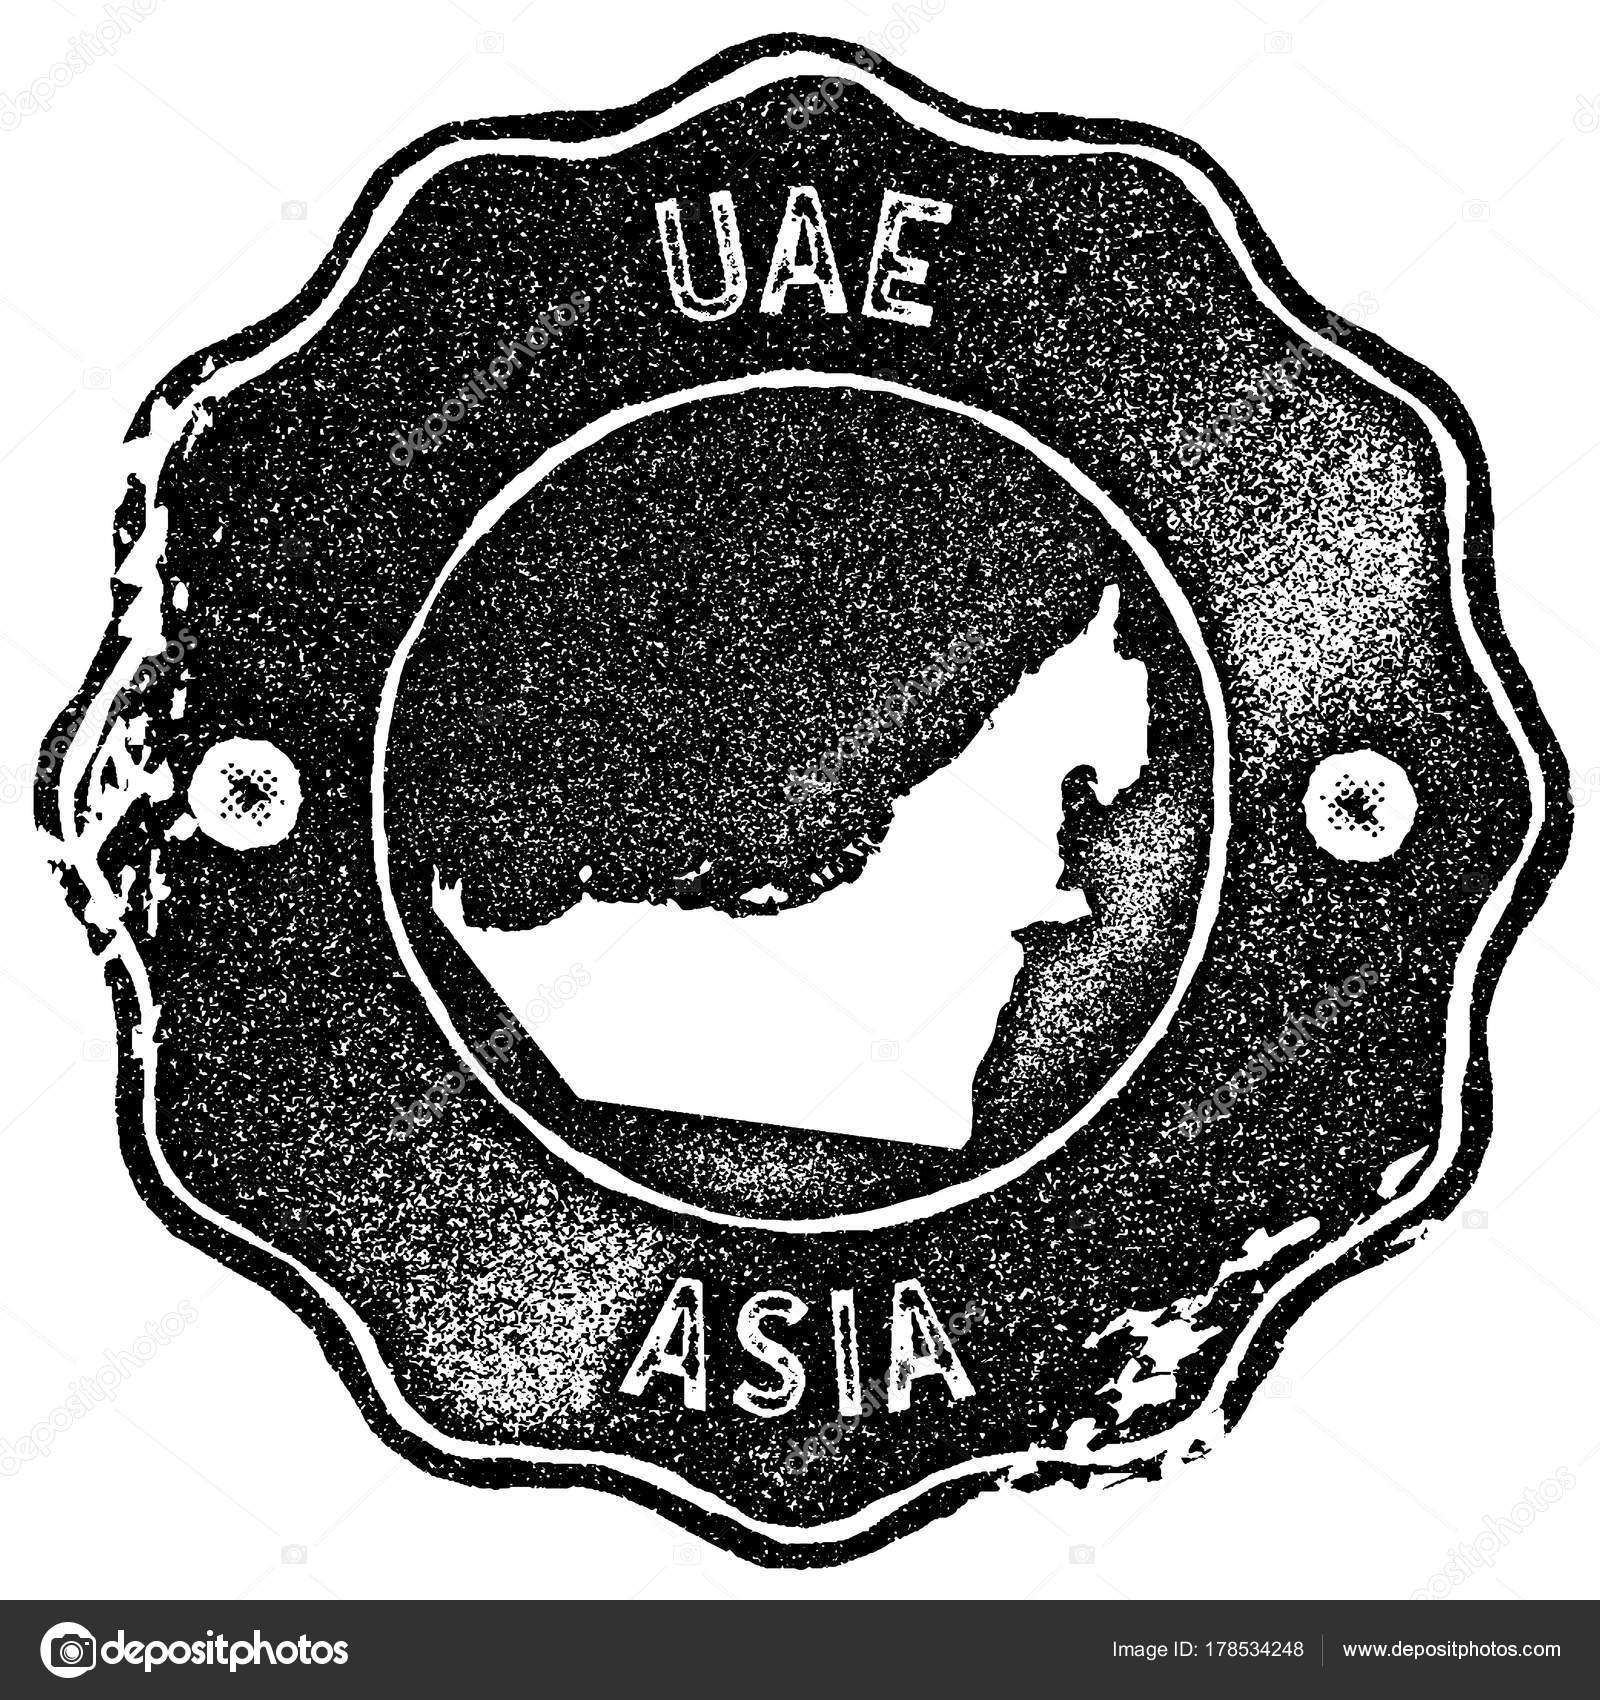 uae map vintage stamp retro style handmade label badge or element for travel souvenirs black